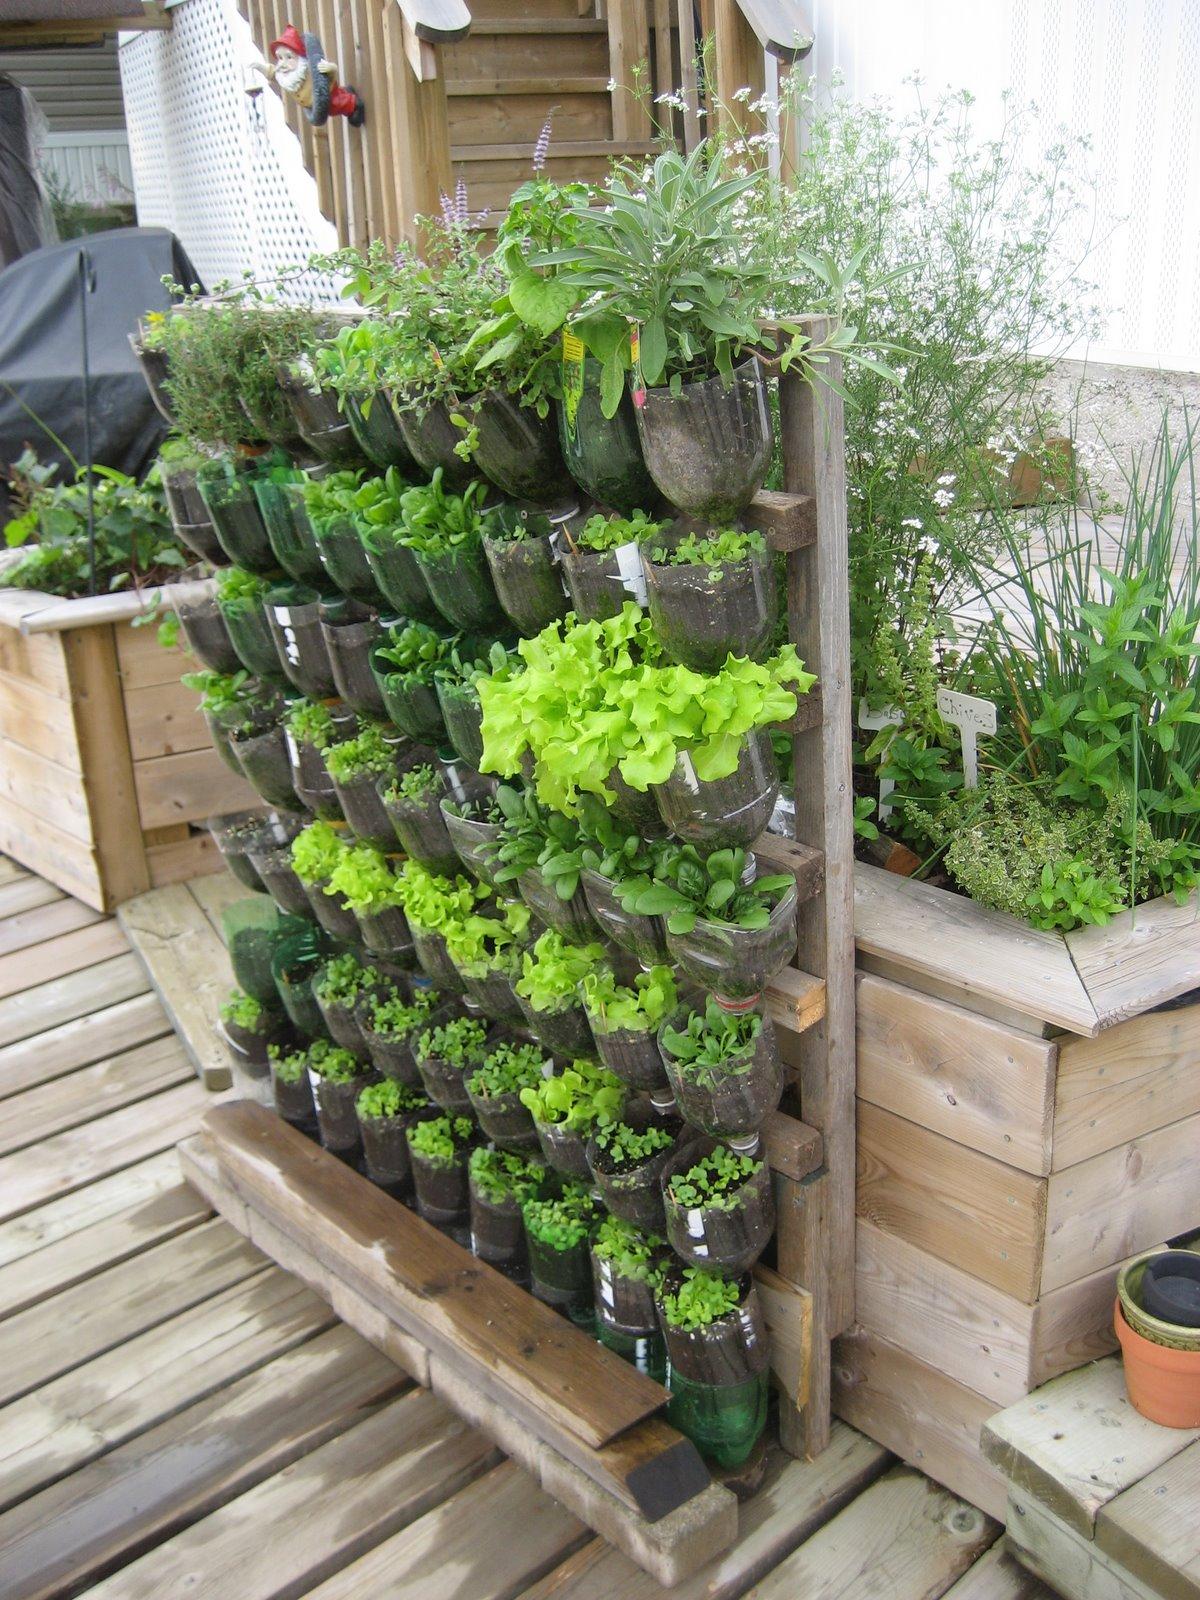 Top 10 DIY Vertical Garden Ideas That You Will Find Helpful on Backyard Landscape  id=98831